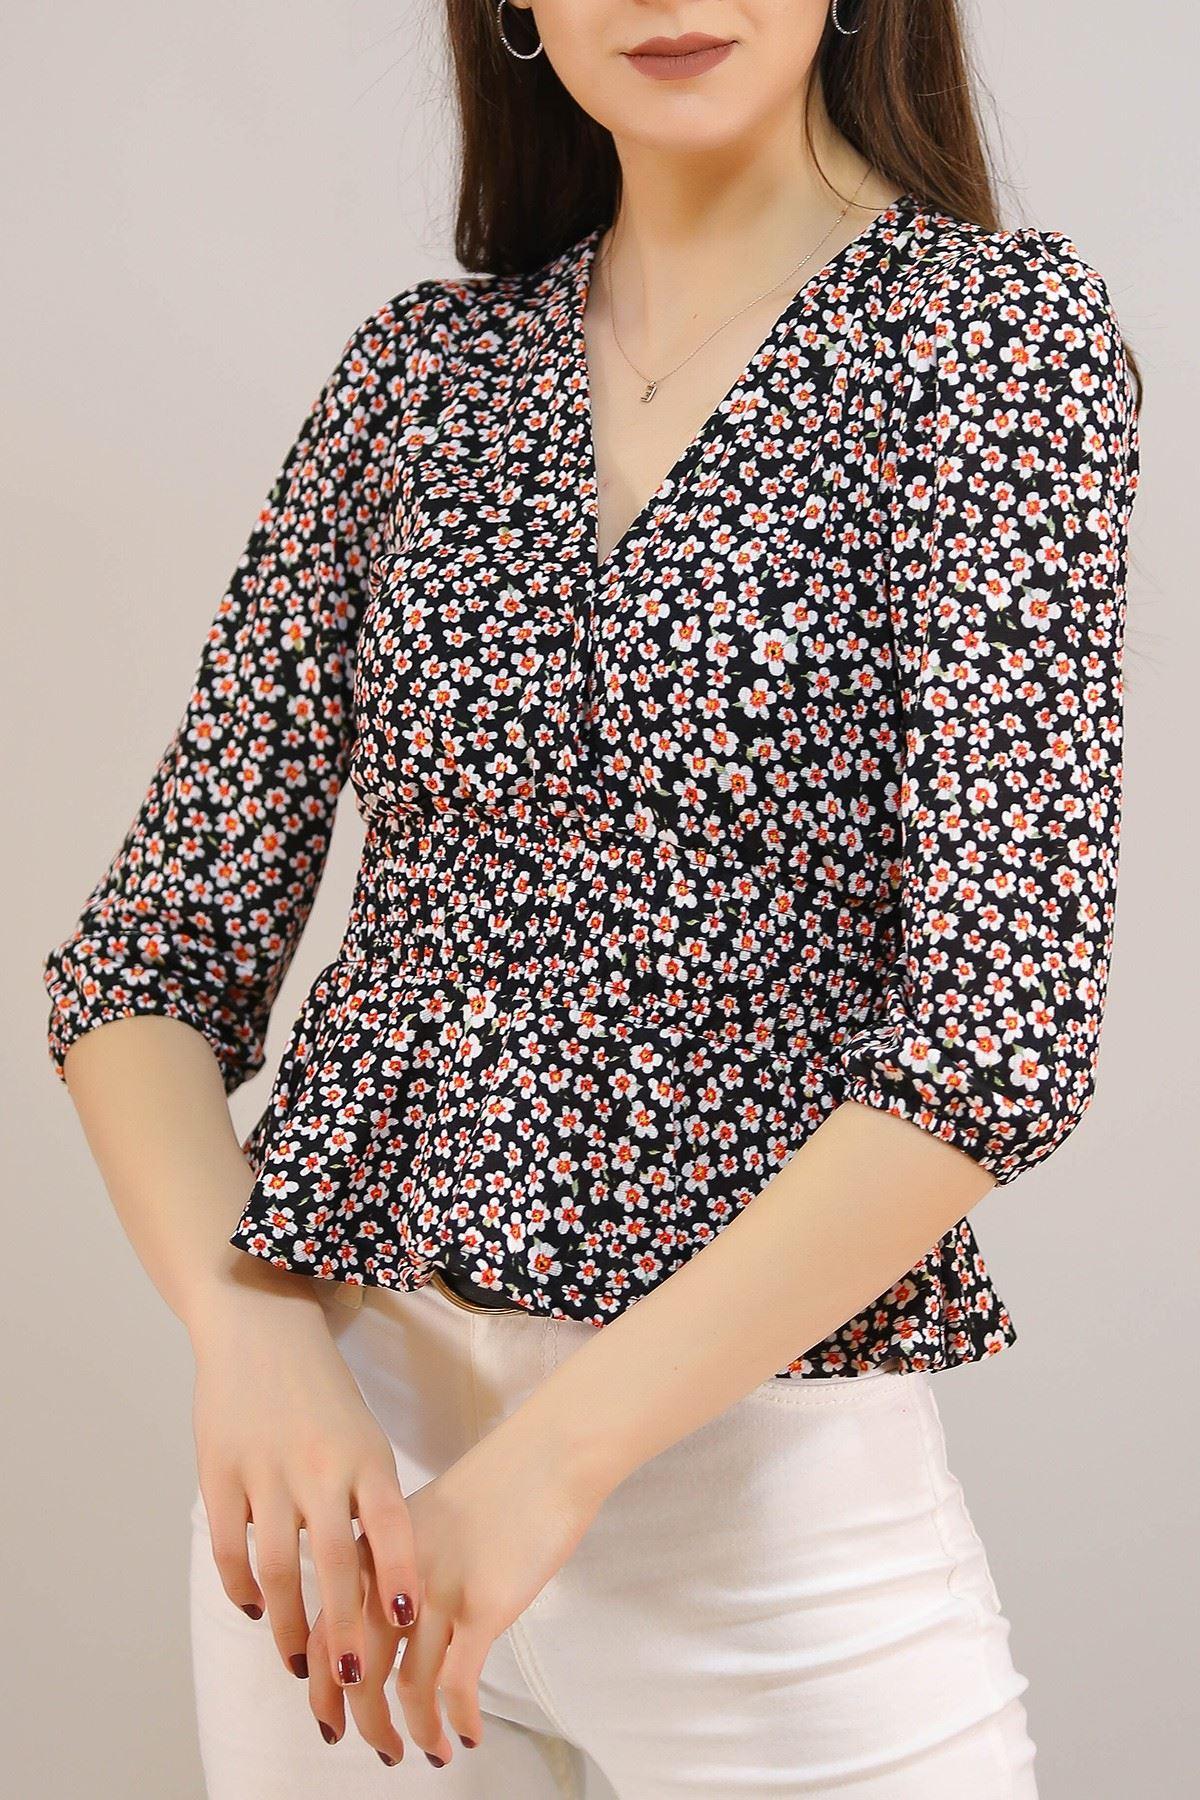 Kruvaze Bluz Siyahbeyaz - 5208.224.